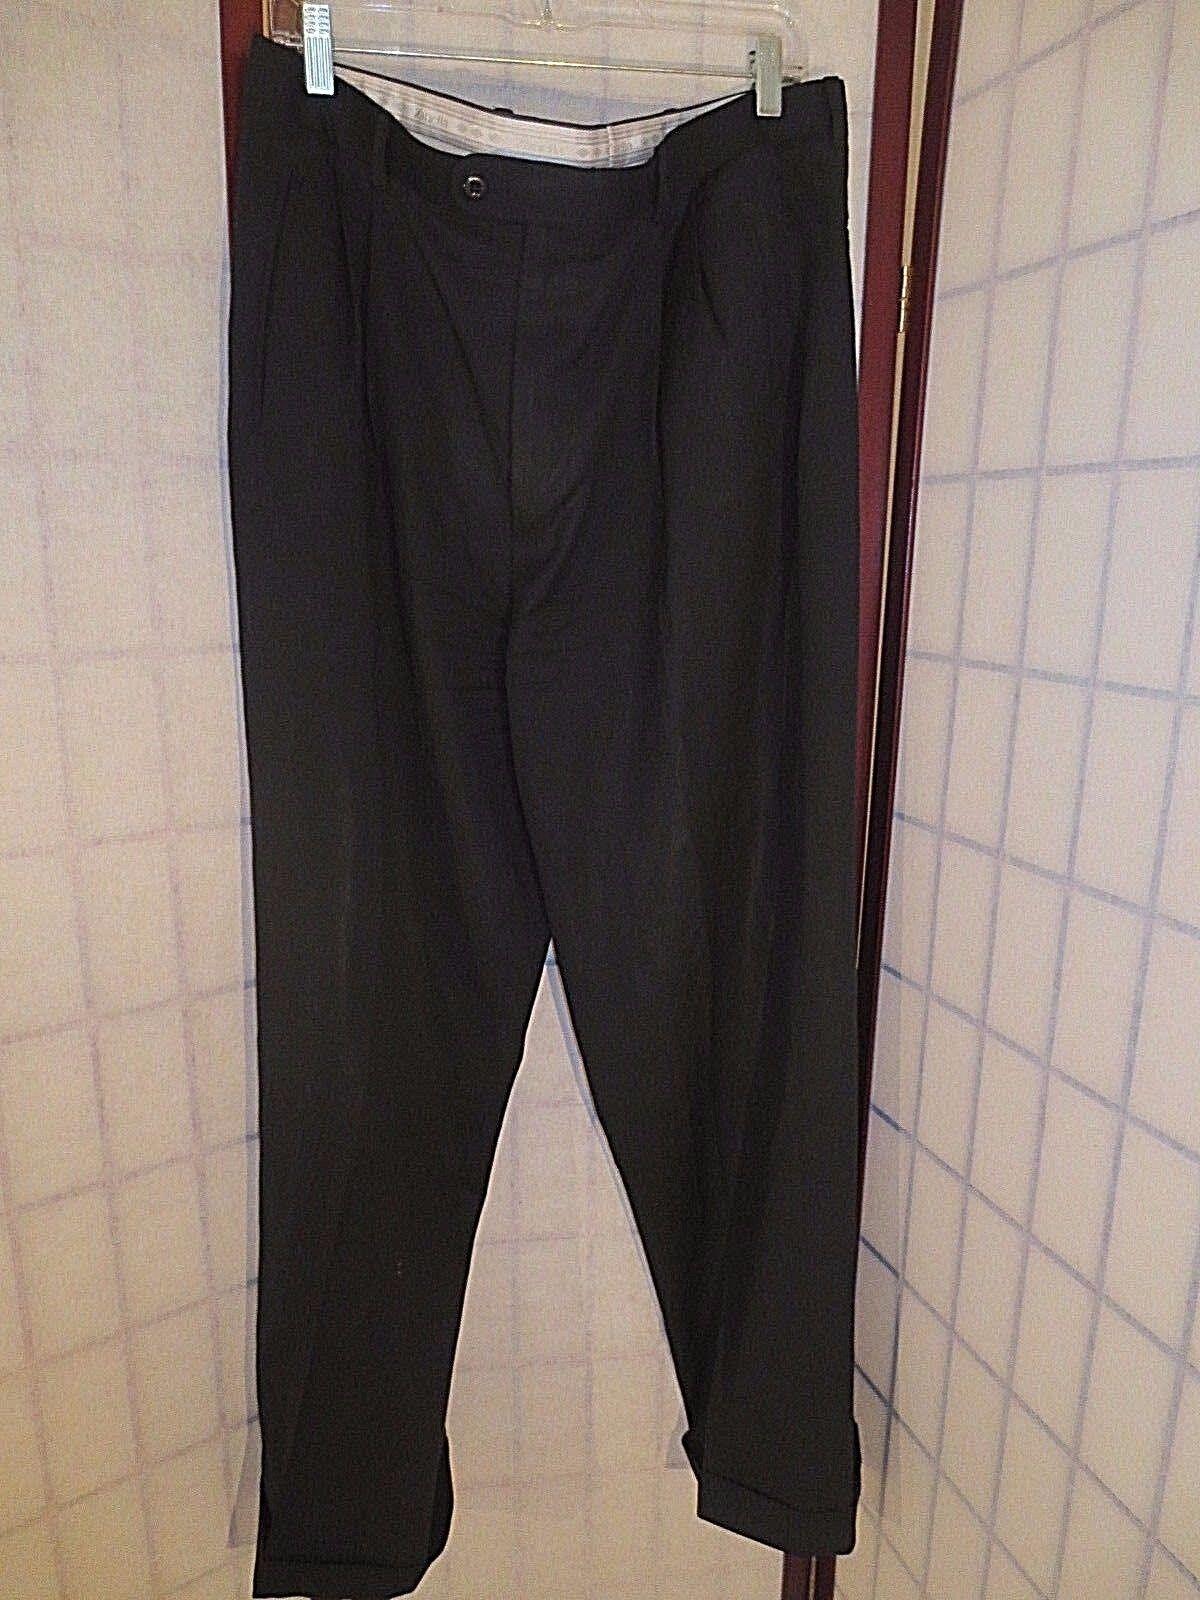 Men's Zanella Duncan Pleated & Cuffed 100% Lightweight Wool Pants 34 x 31.5